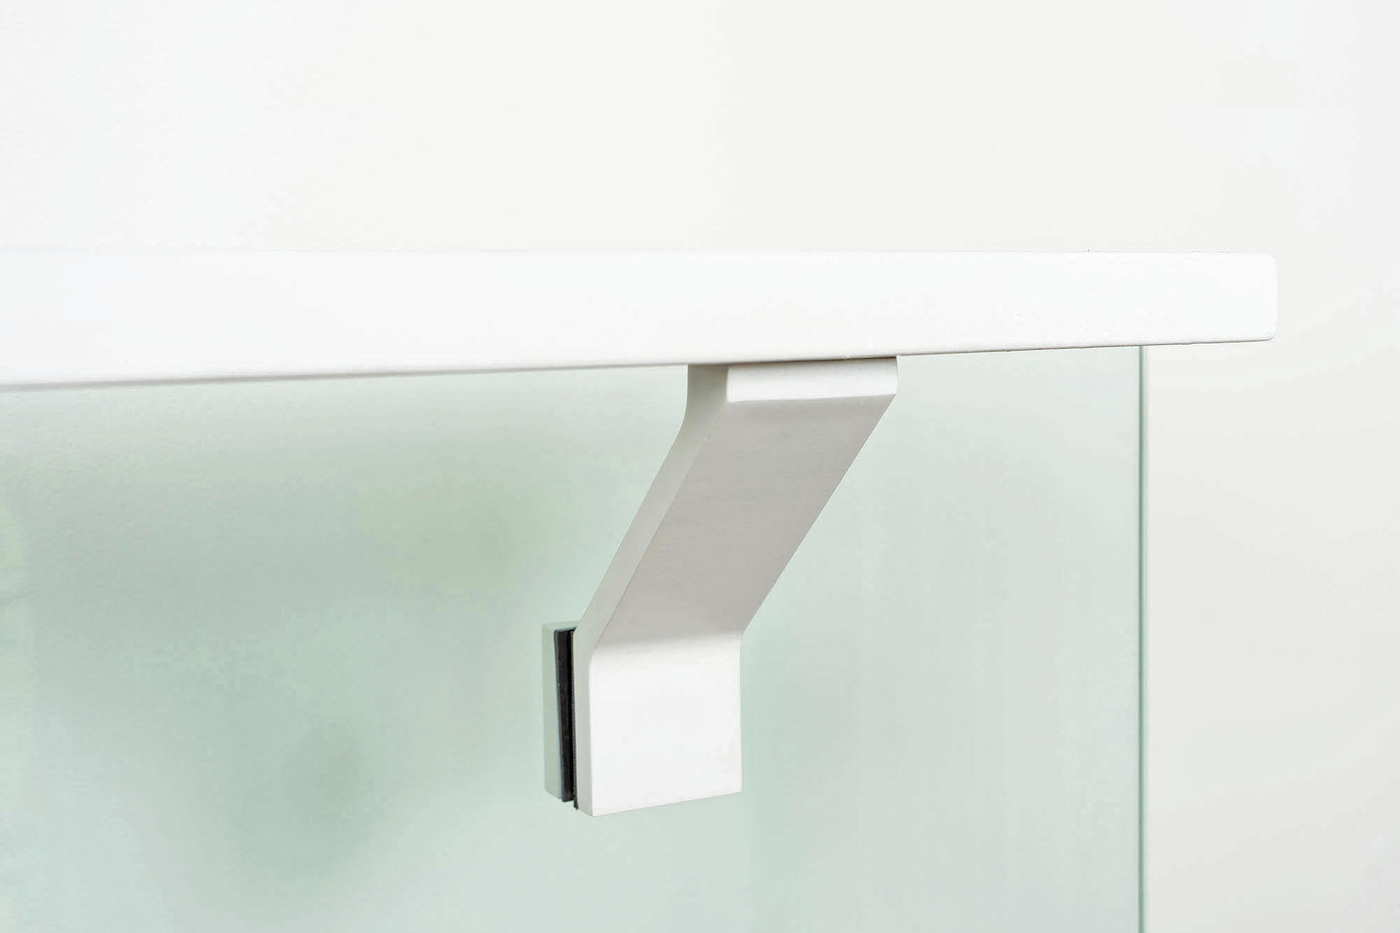 Glass-mounted-white-handrail-bracket